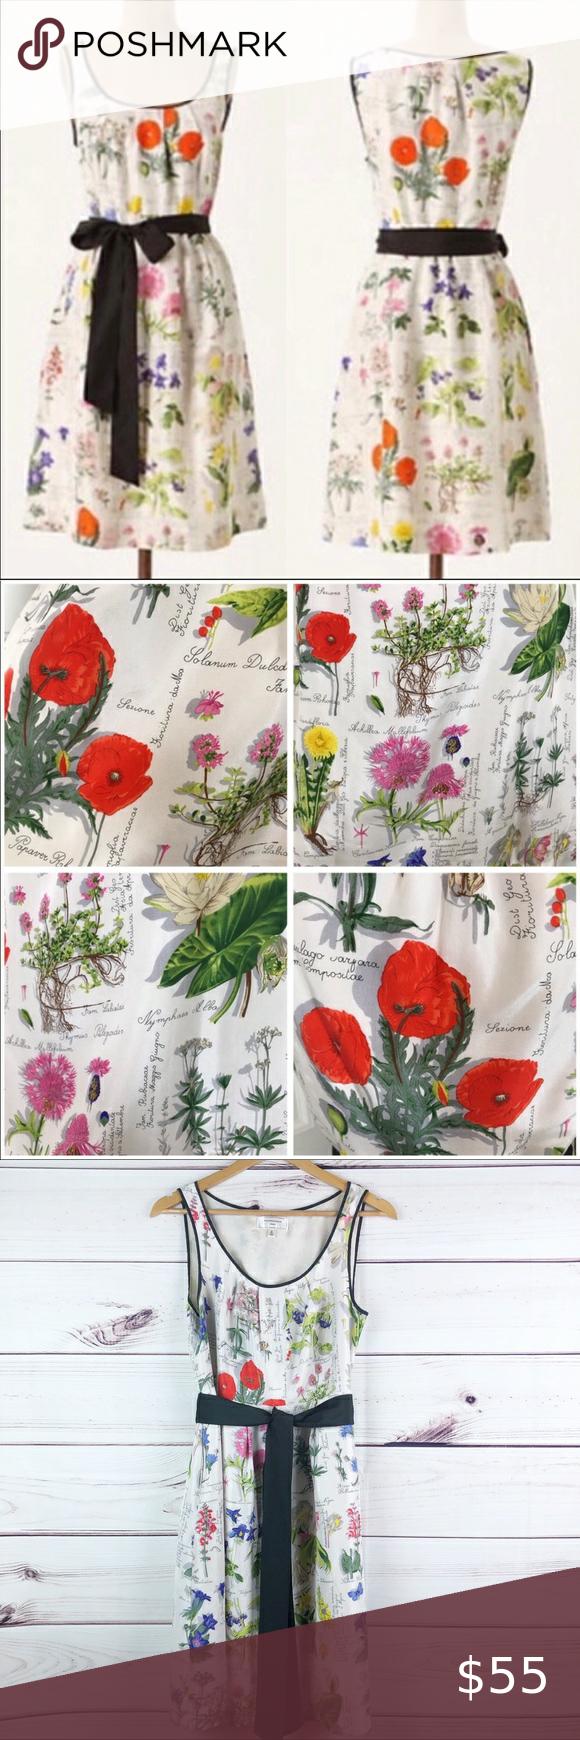 Anthropologie 100/% Silk Floral Dust Bag **New**